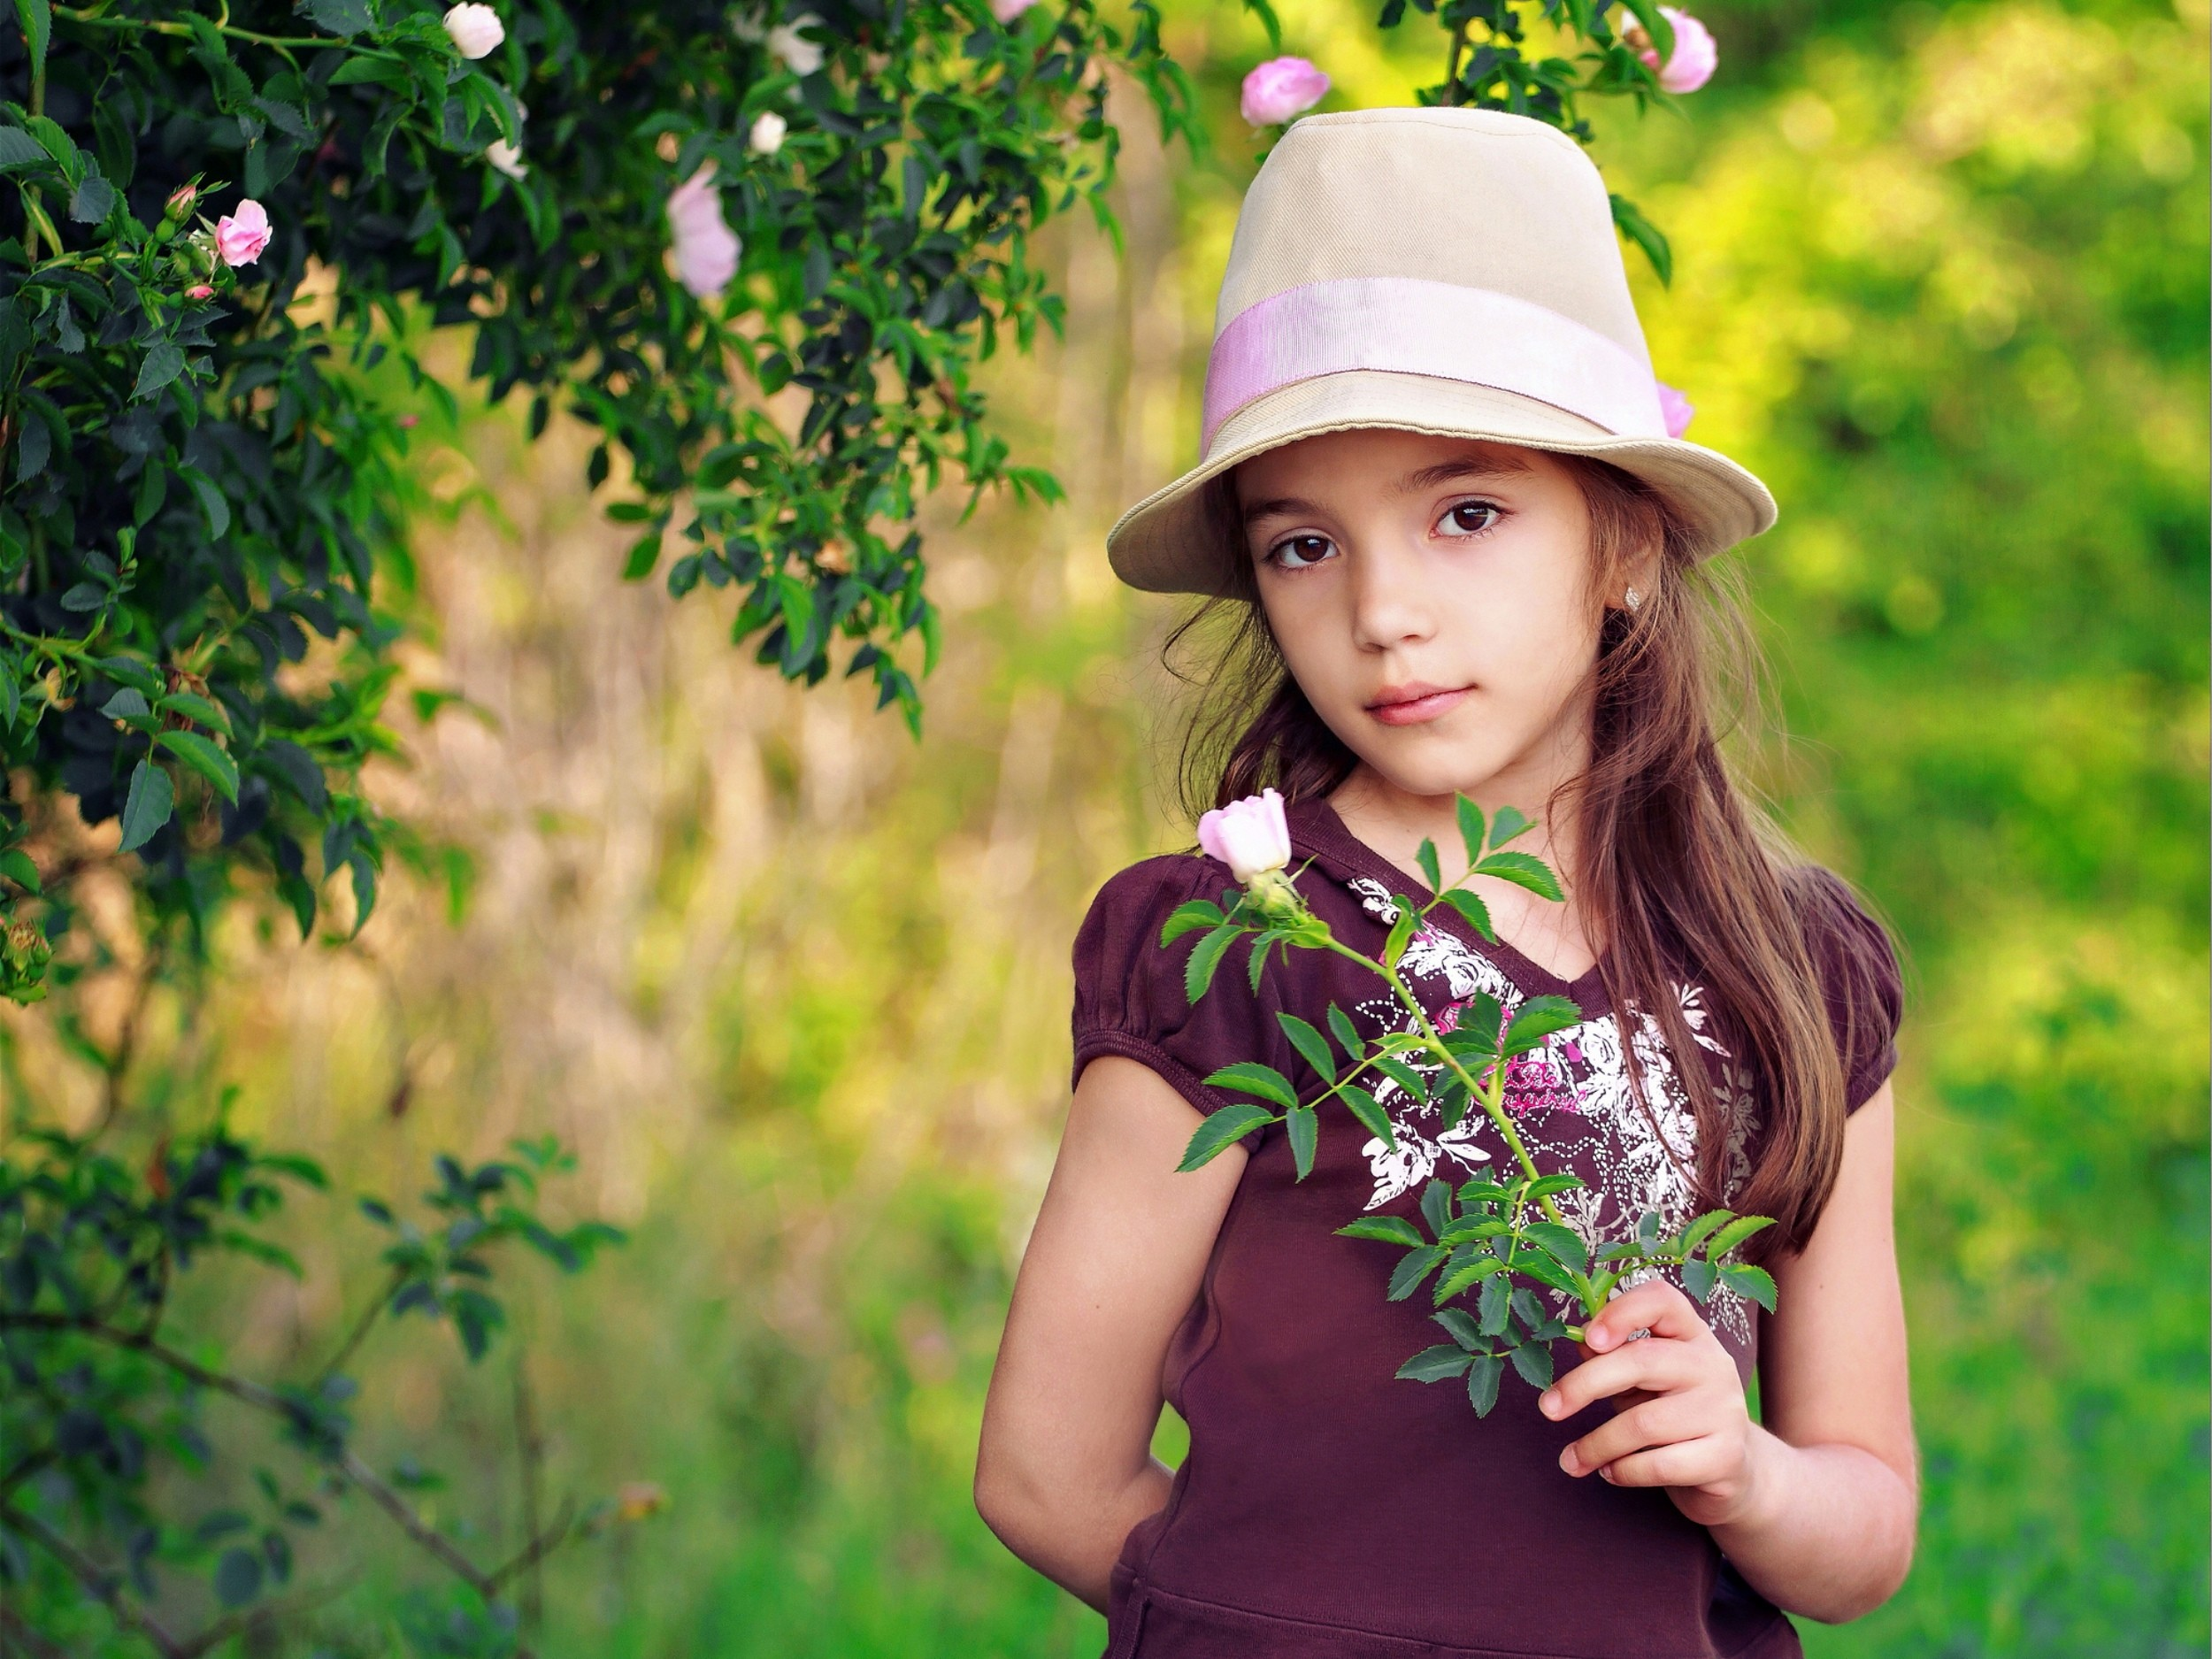 Cute Girl Wallpapers HD   HD Wallpapers   Pinterest   Girl wallpaper and  Wallpaper